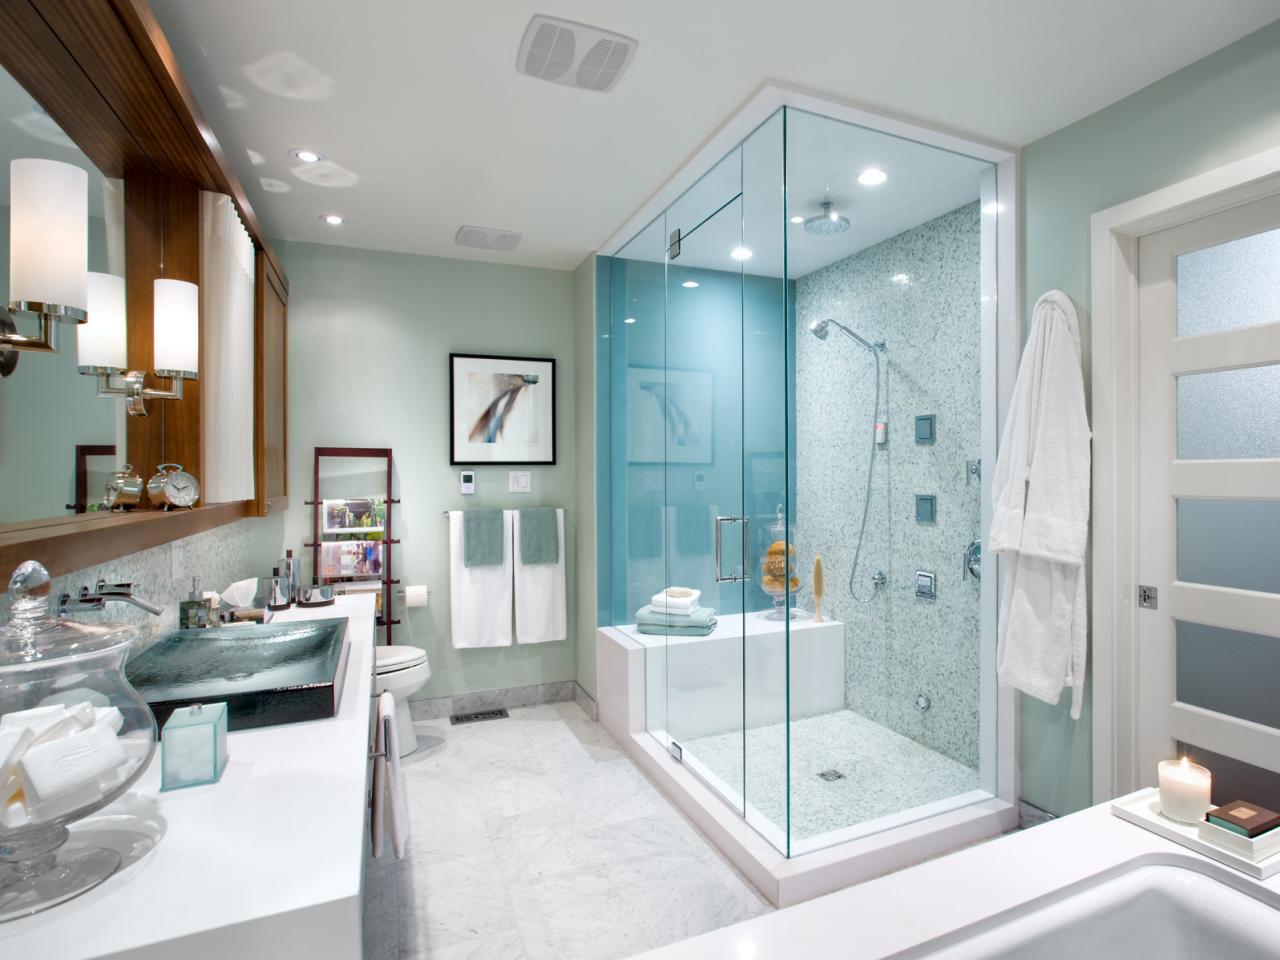 banyo-dekorasoynu-kucuk-buyuk-banyo-aksesuarlari